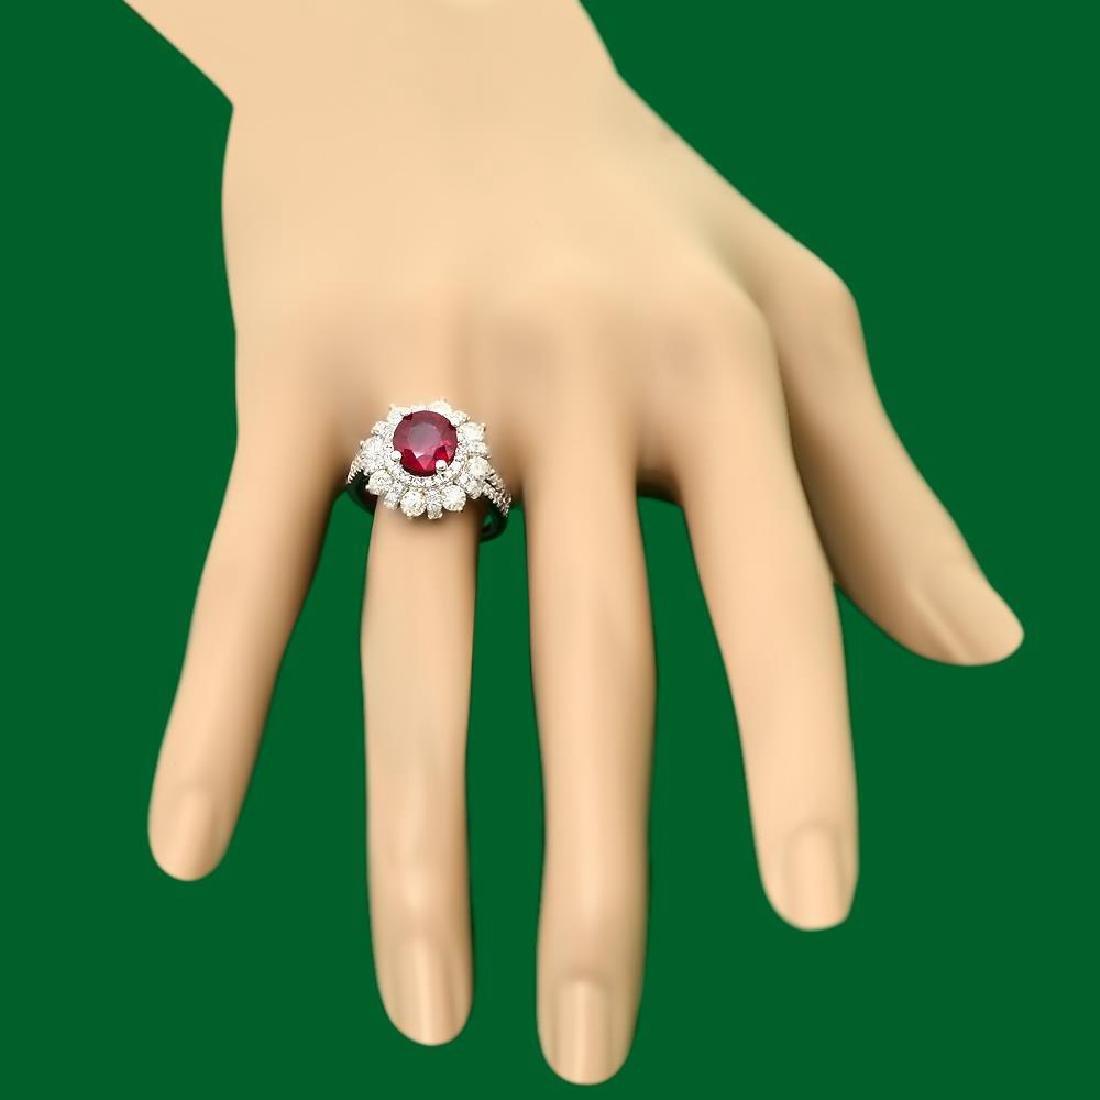 14k Gold 2.52ct Ruby 1.90ct Diamond Ring - 3